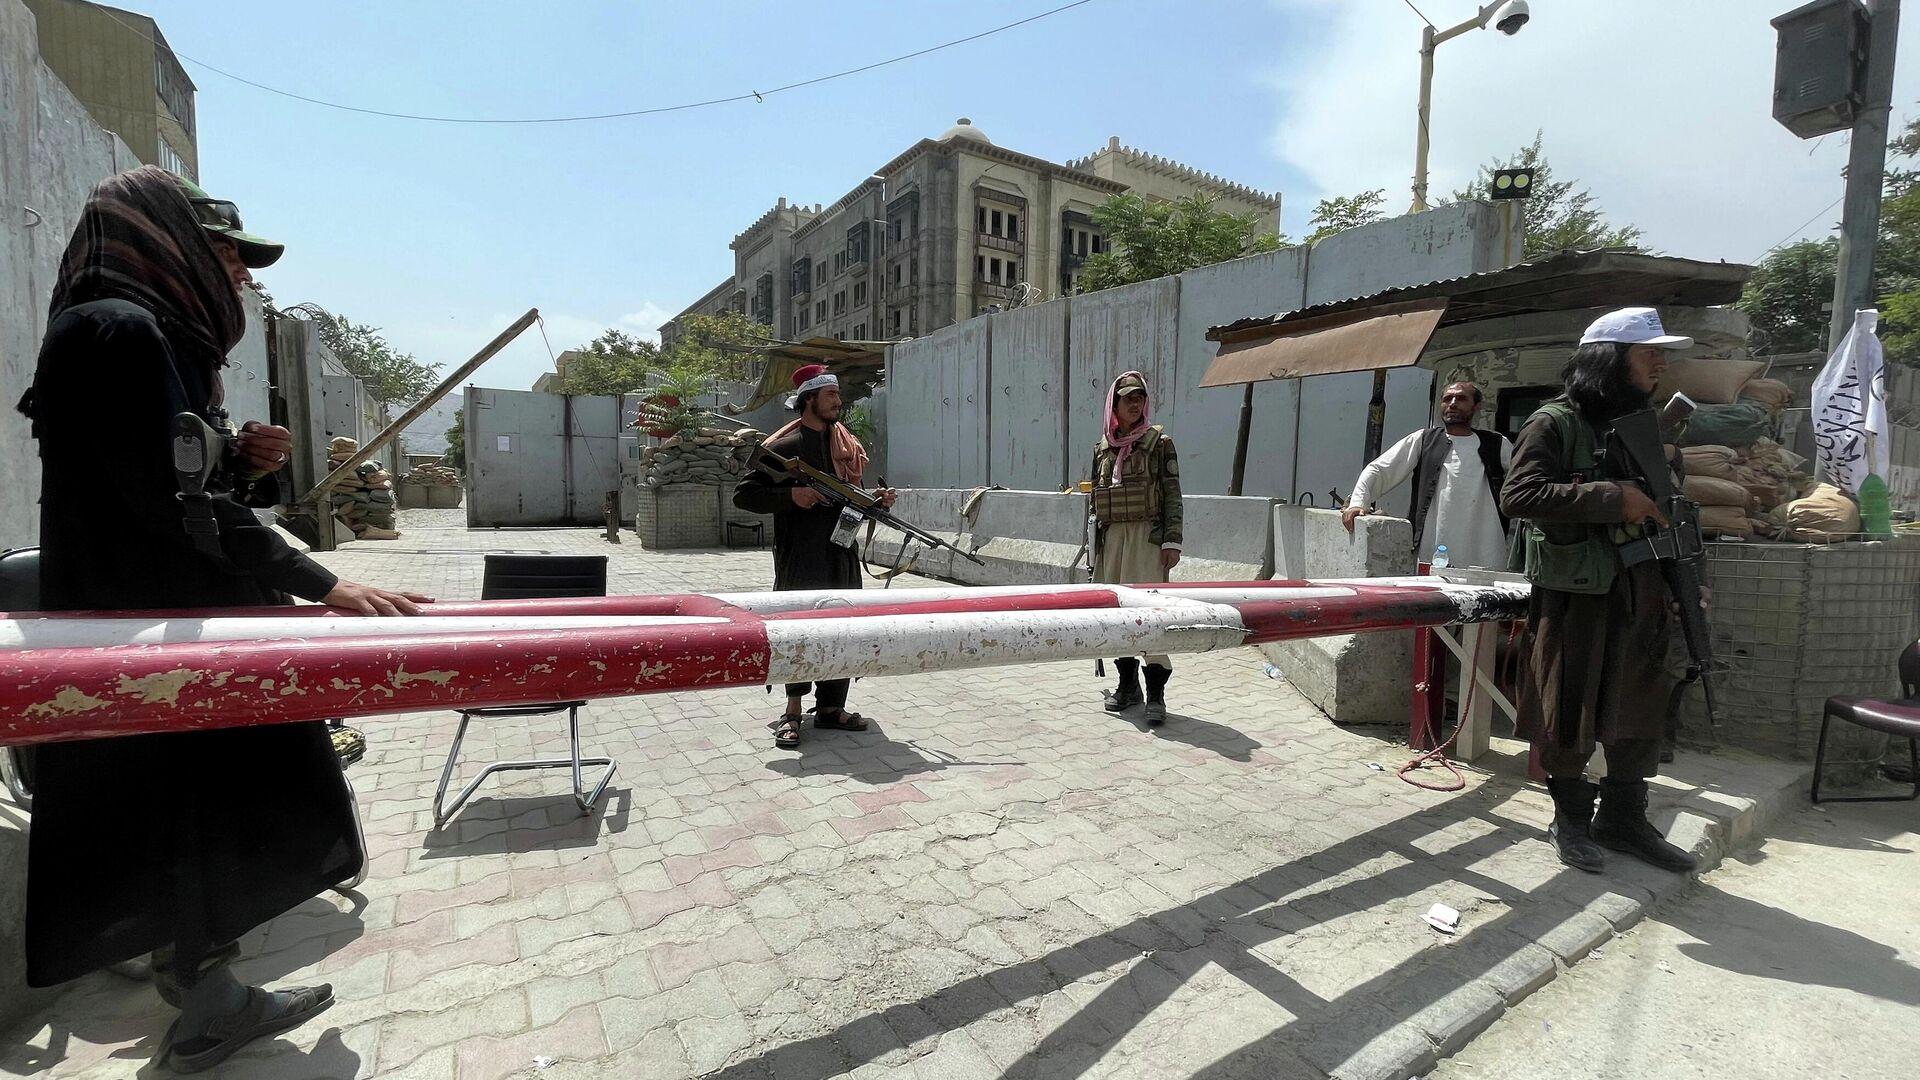 Los talibanes en Kabul - Sputnik Mundo, 1920, 18.08.2021